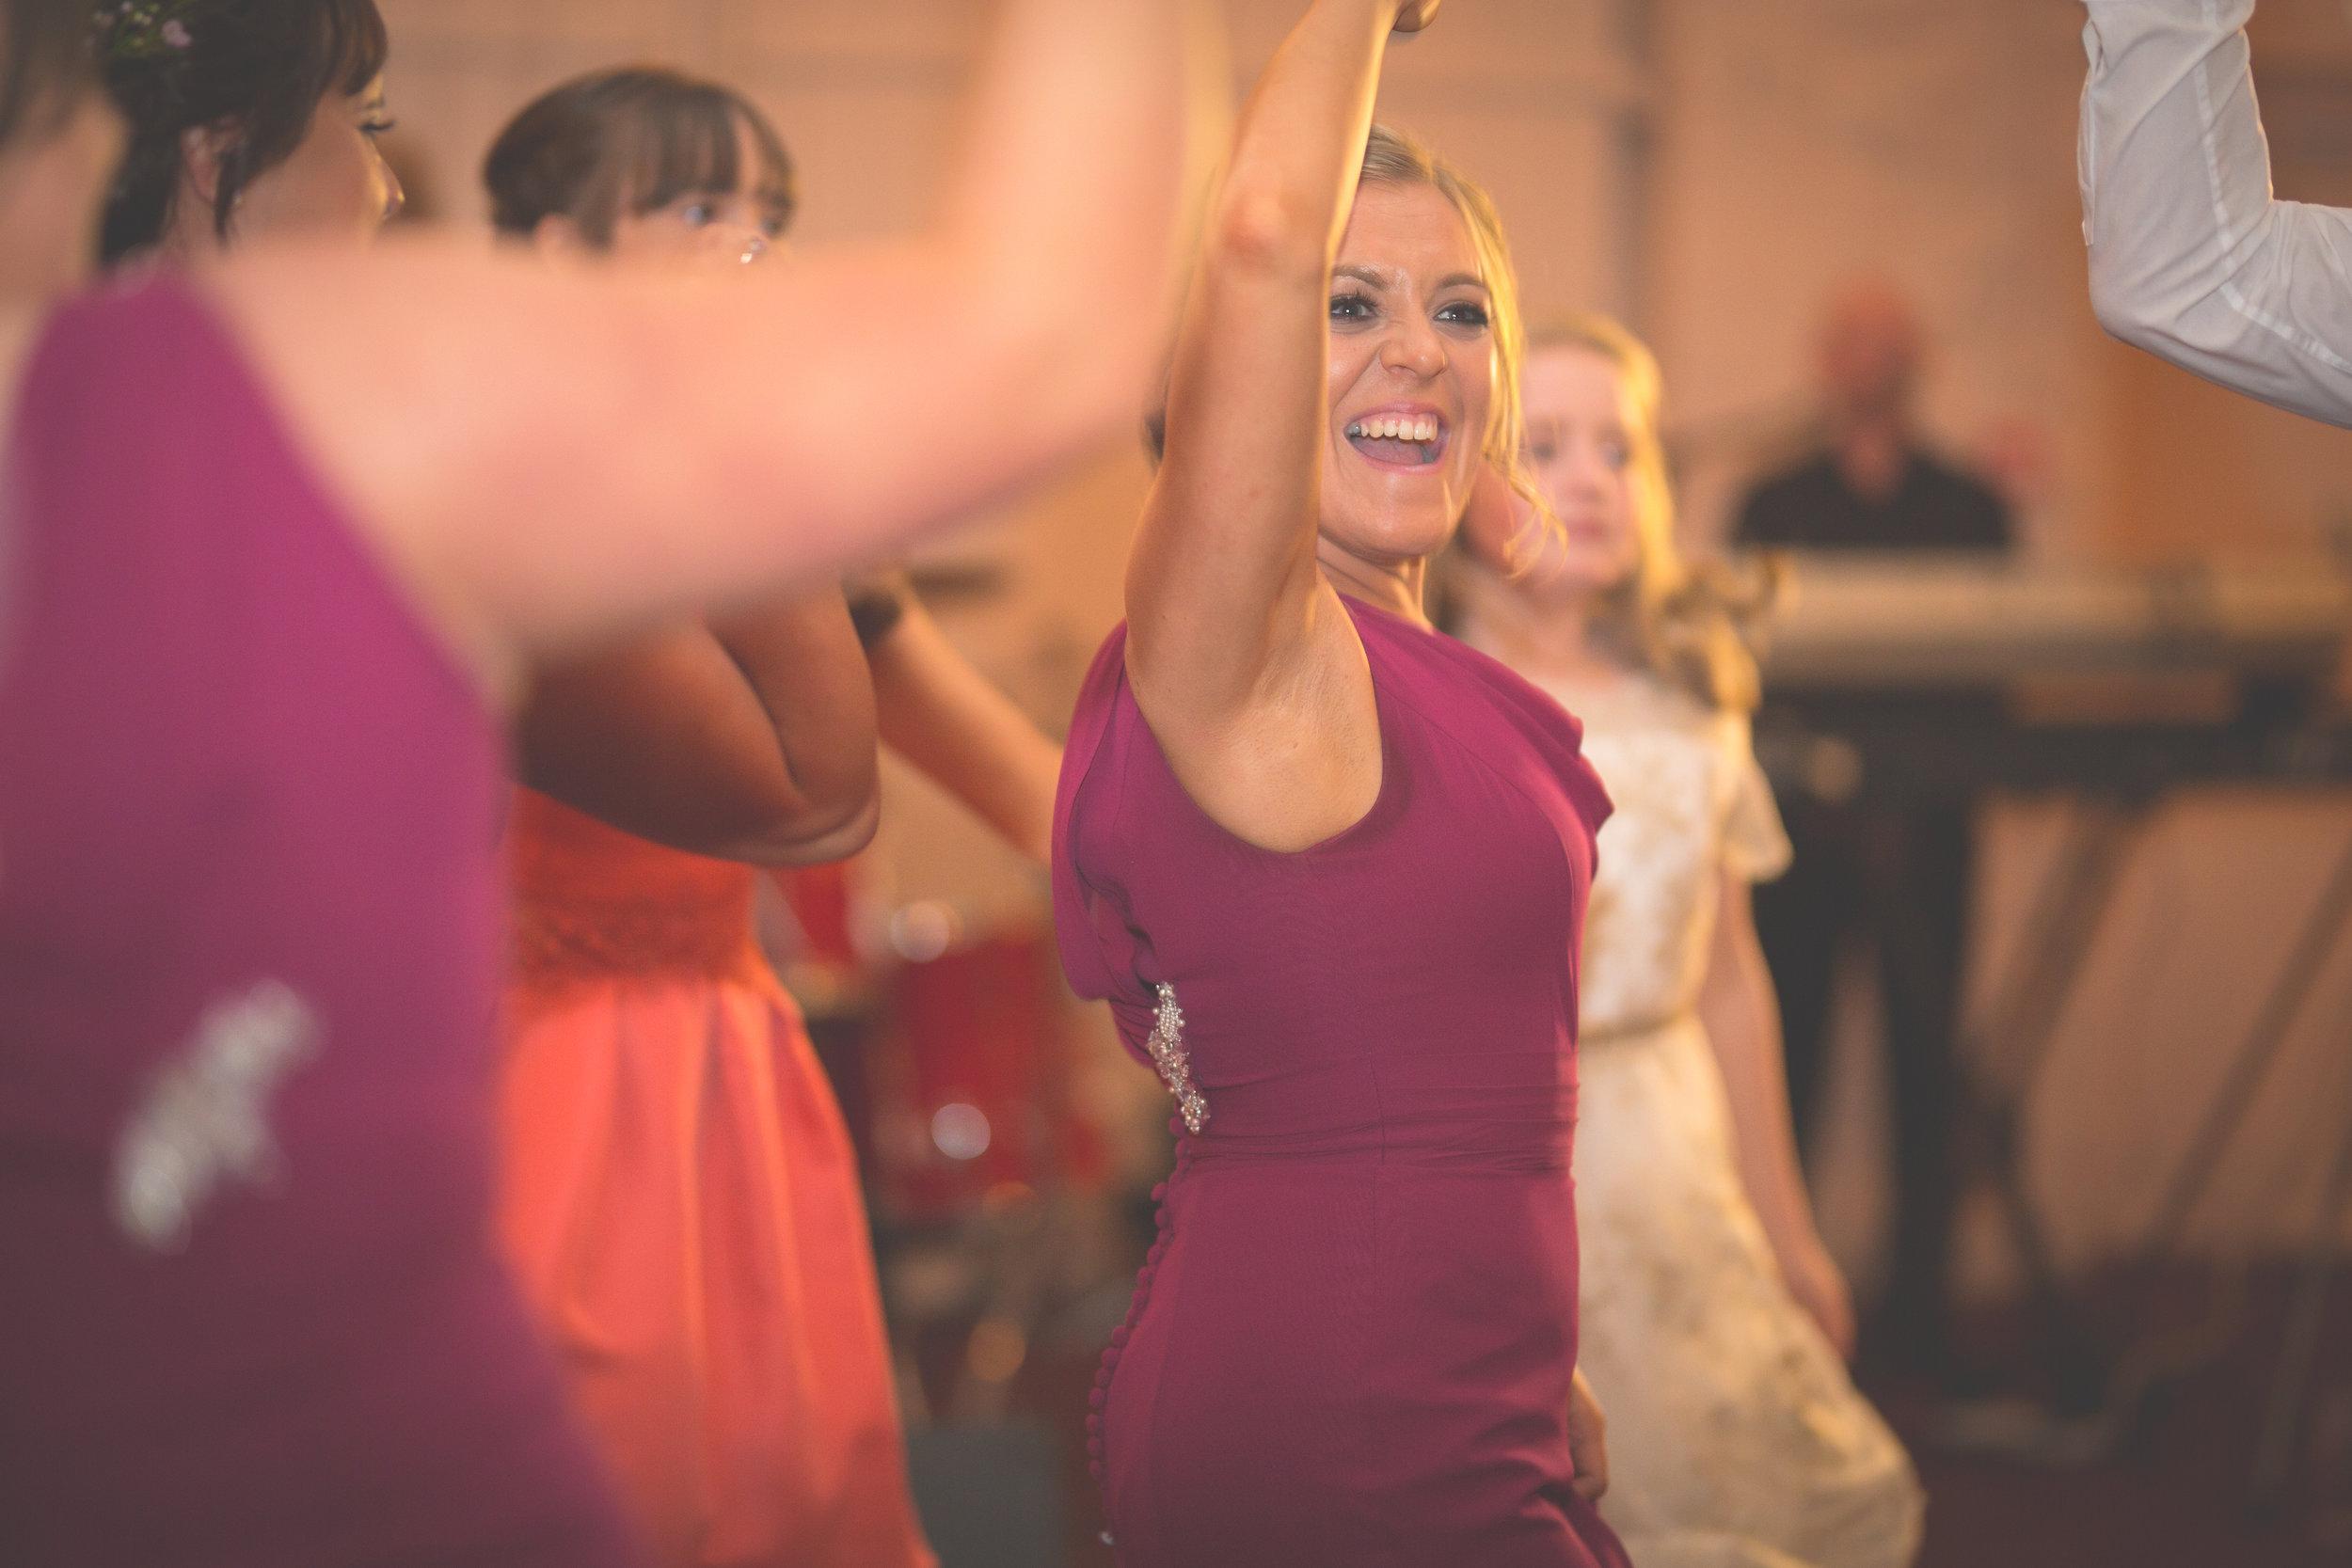 Brian McEwan Wedding Photography | Carol-Annee & Sean | The Dancing-67.jpg